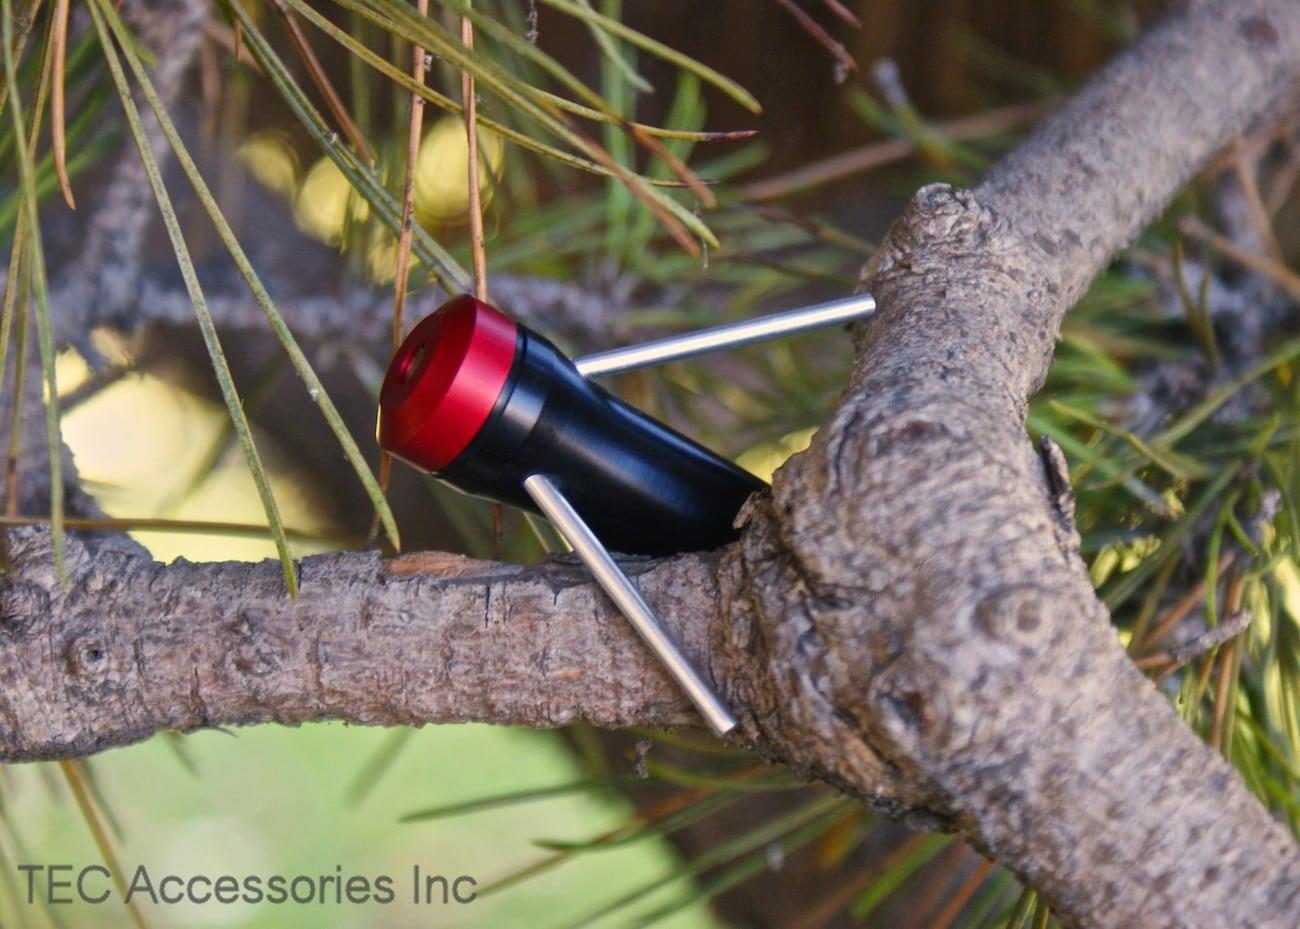 TEC RETREEVE Mini Grappling Hook Retriever